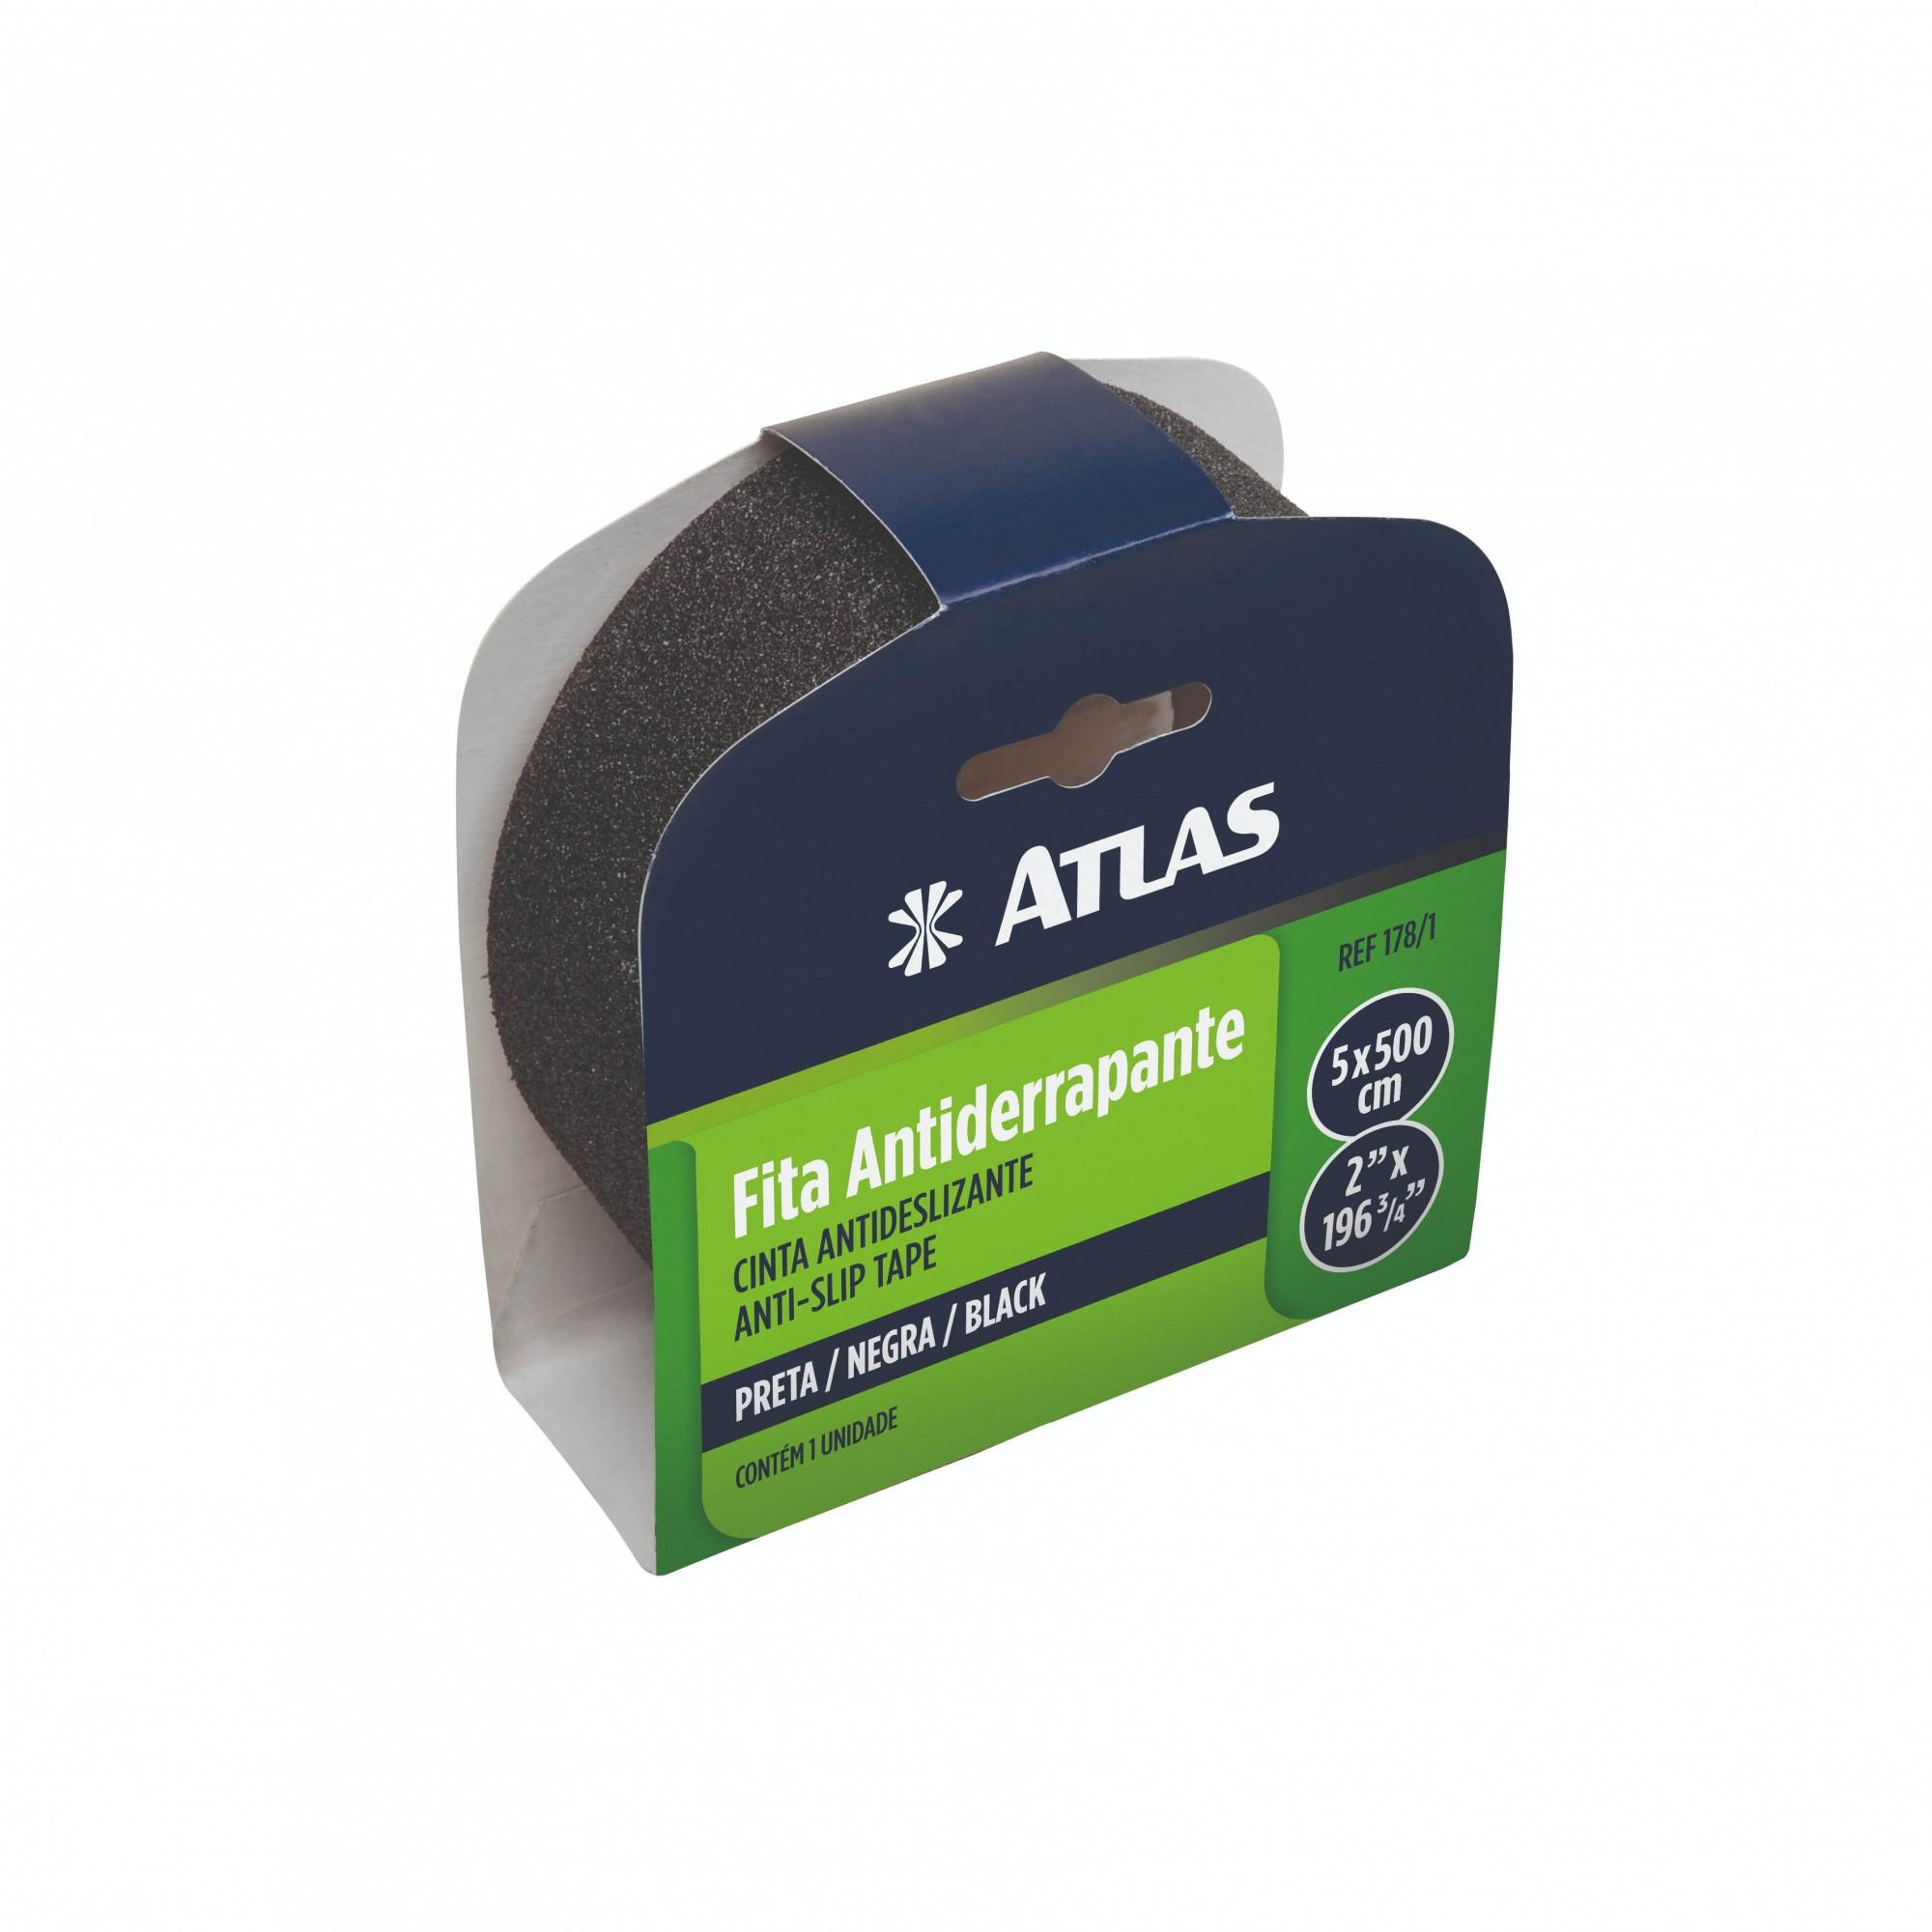 Fita Adesiva Antiderrapante Preta 5 Metros Atlas 178/1.